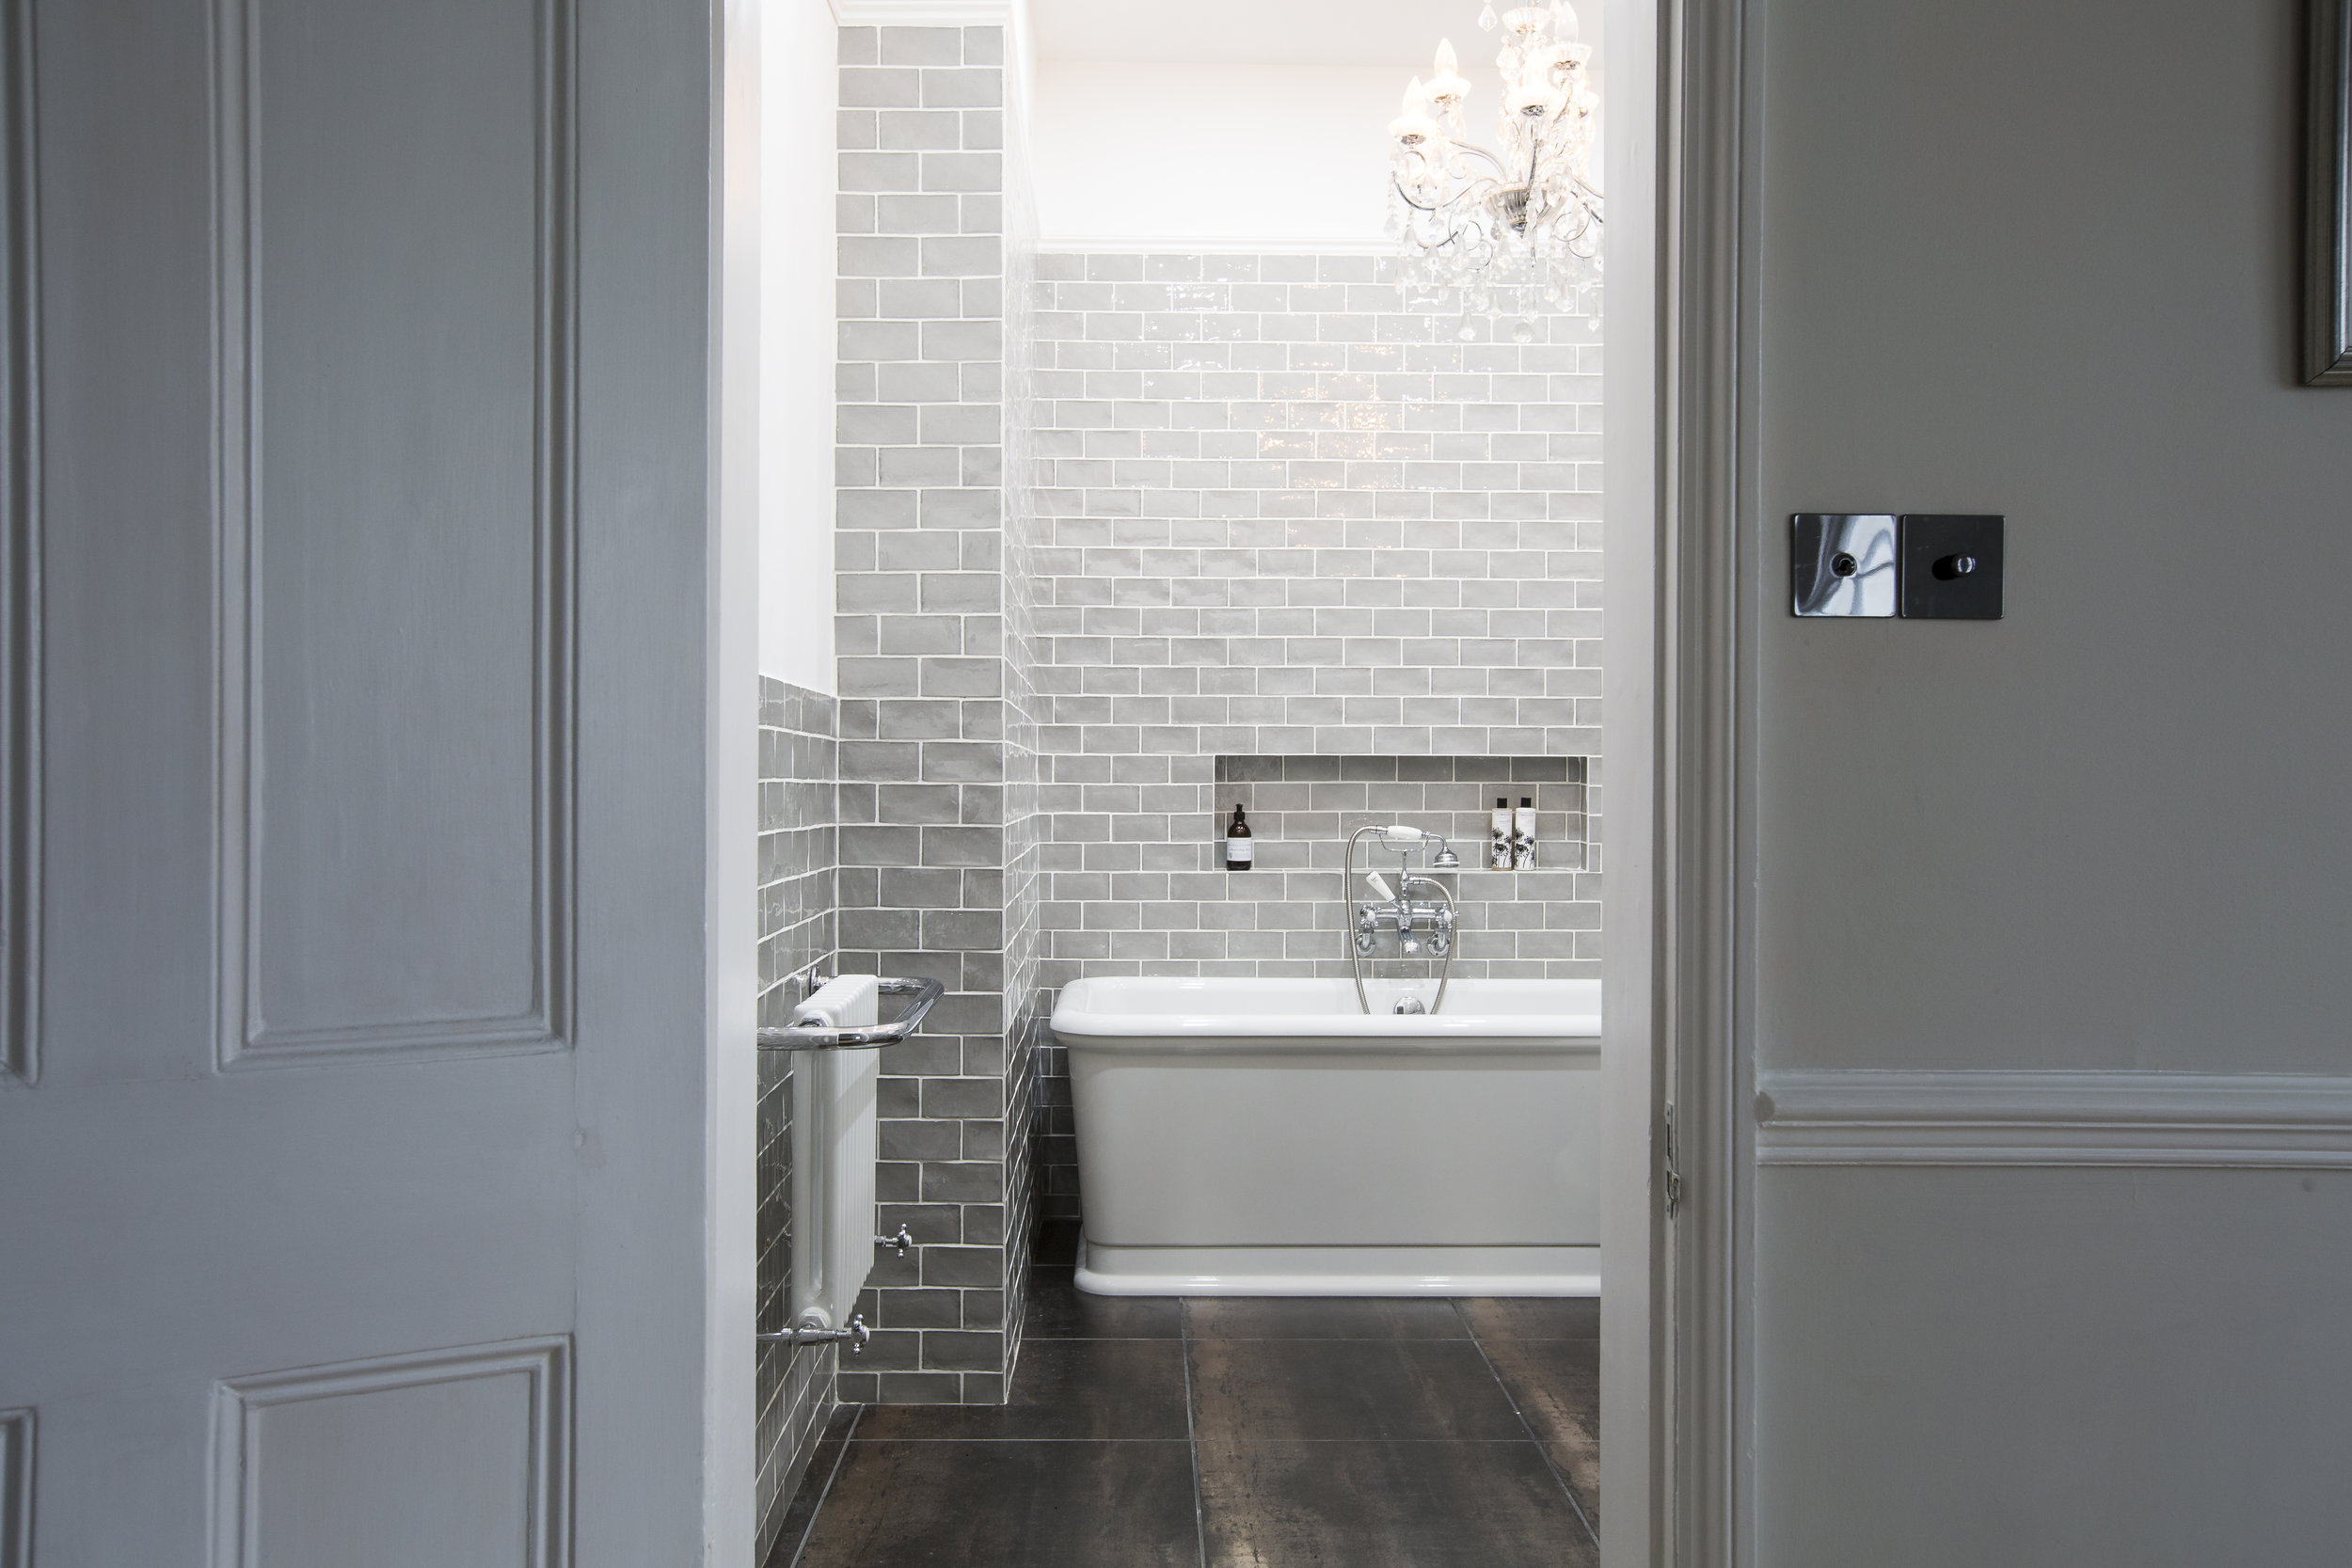 Uplands West Family Bathroom_01.JPG